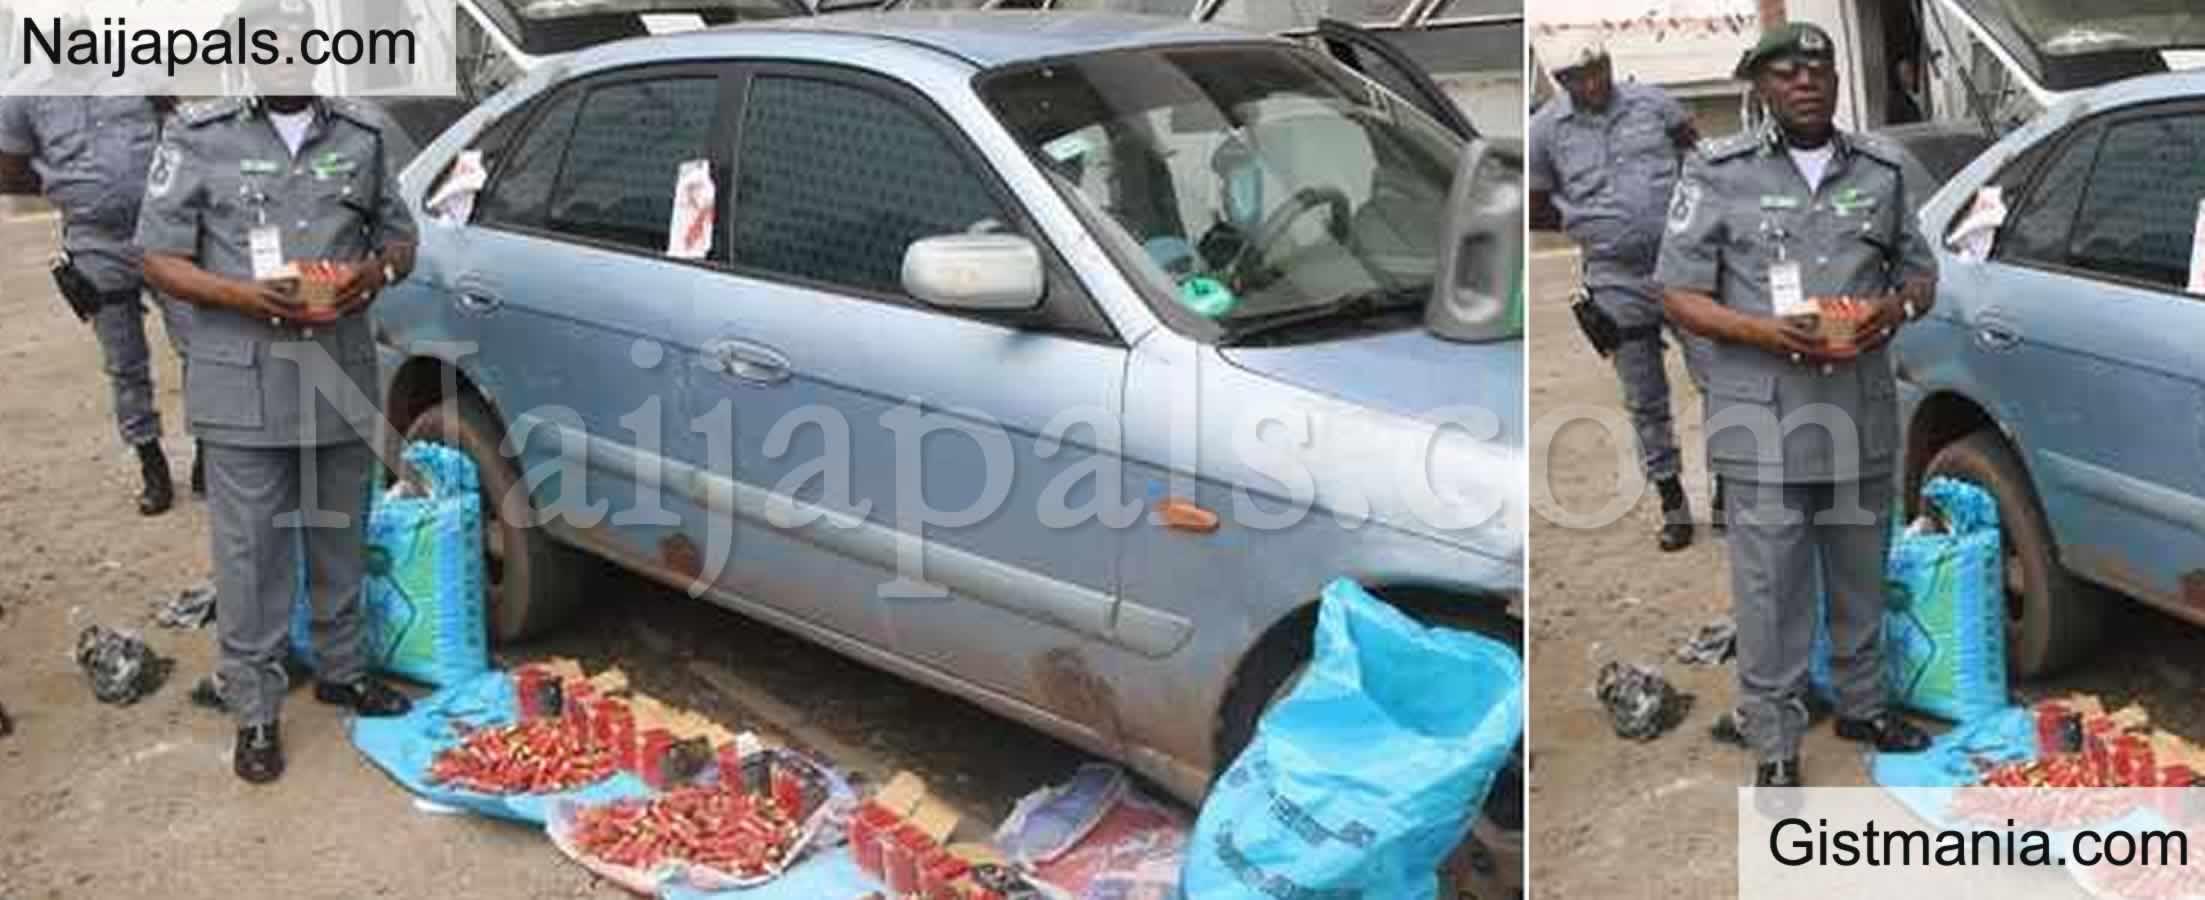 <img alt='.' class='lazyload' data-src='https://img.gistmania.com/emot/news.gif' /> <b>Nigerian Customs Intercepts Loads of Live Cartridges Concealed In Sacks Of Garri</b> (Photos)